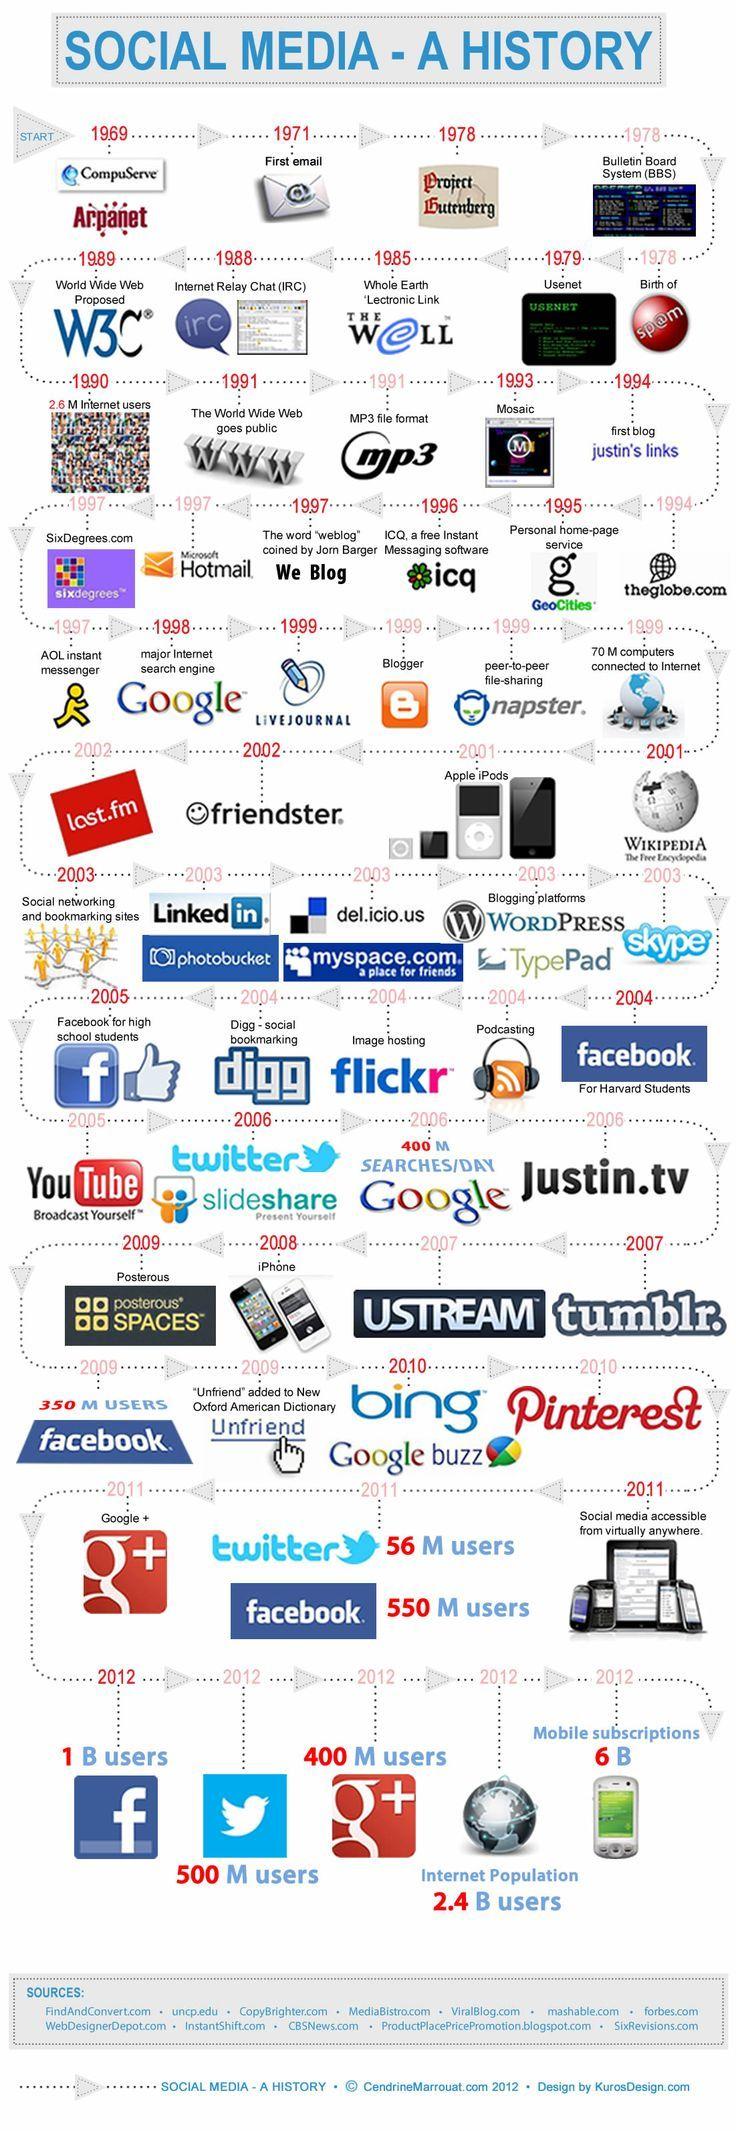 Social Media History #SocialMedia #infographic